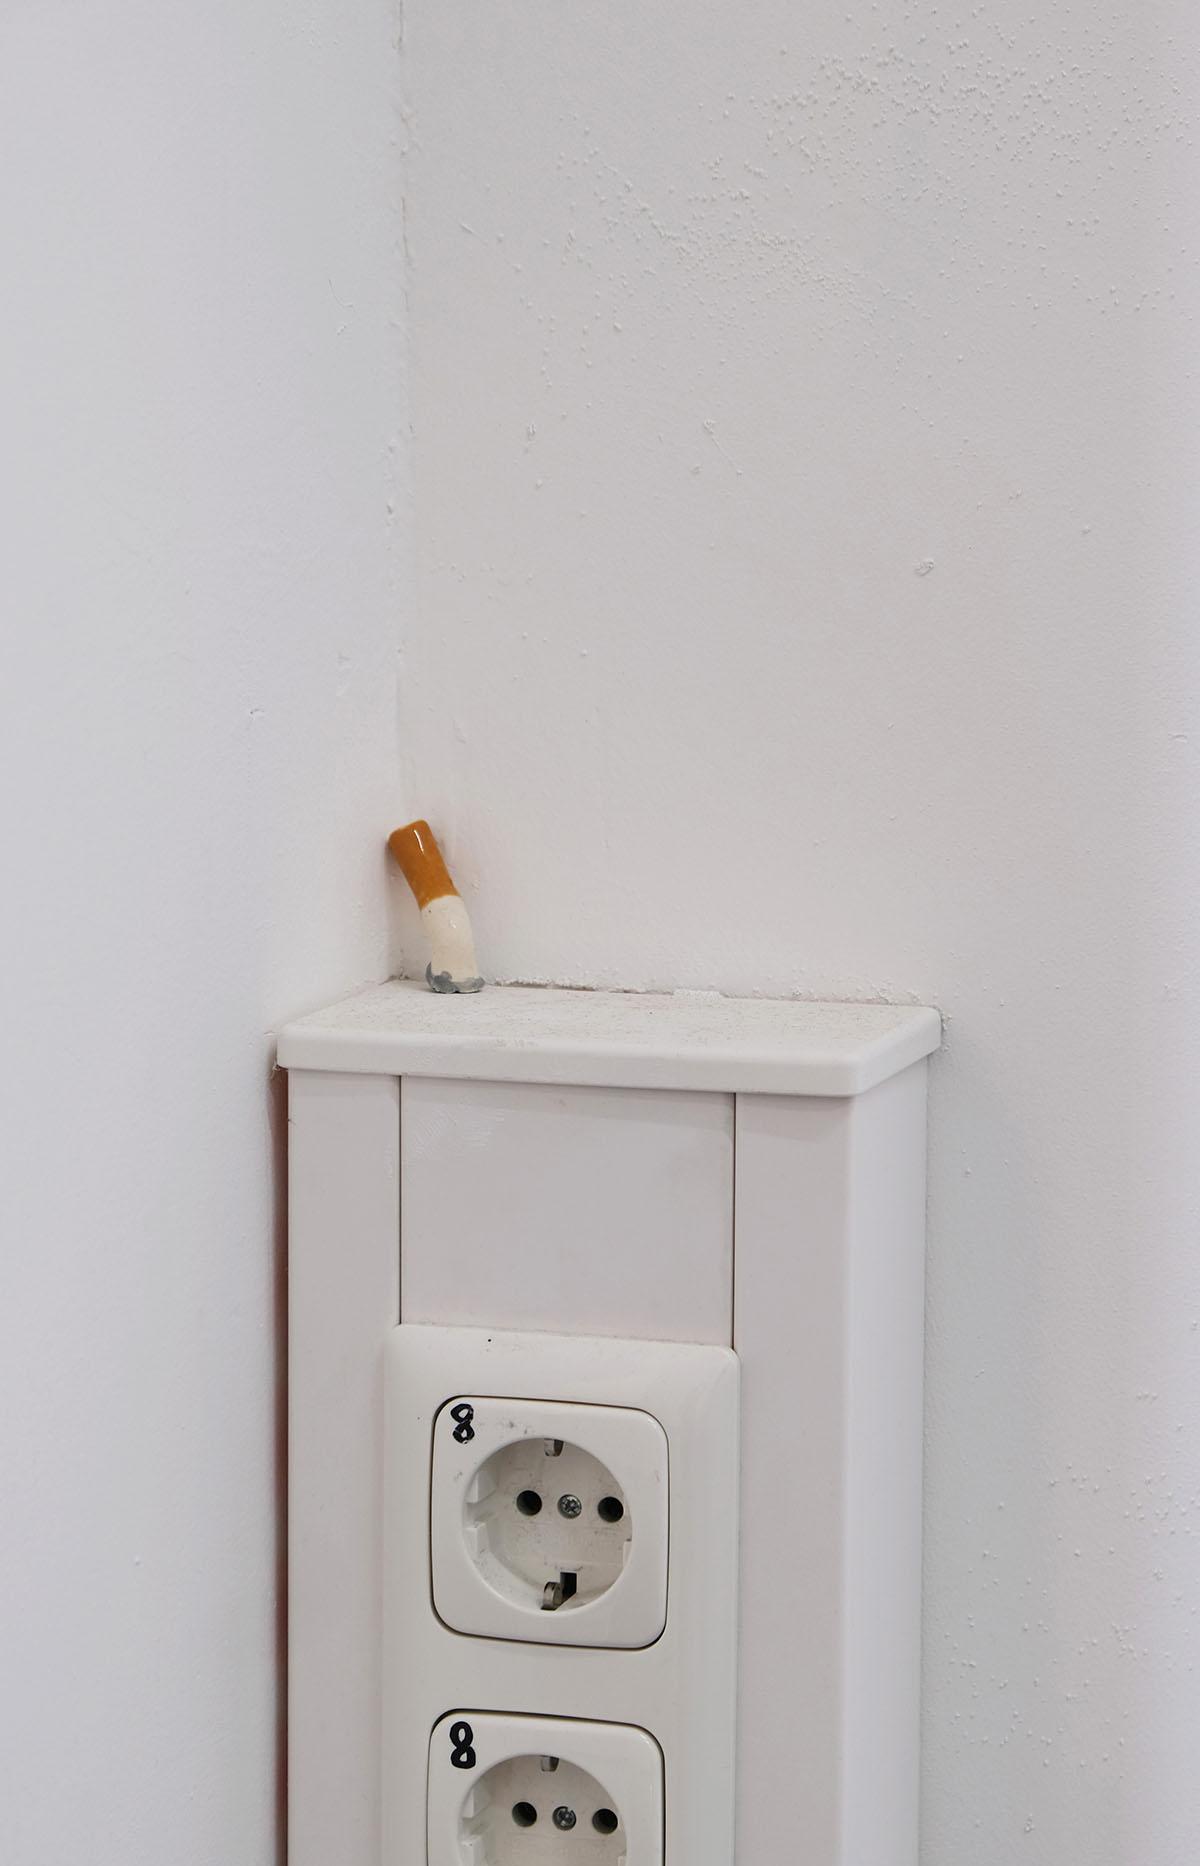 Elisabeth Molin, Stub (2021), Ceramics, dimensions variable